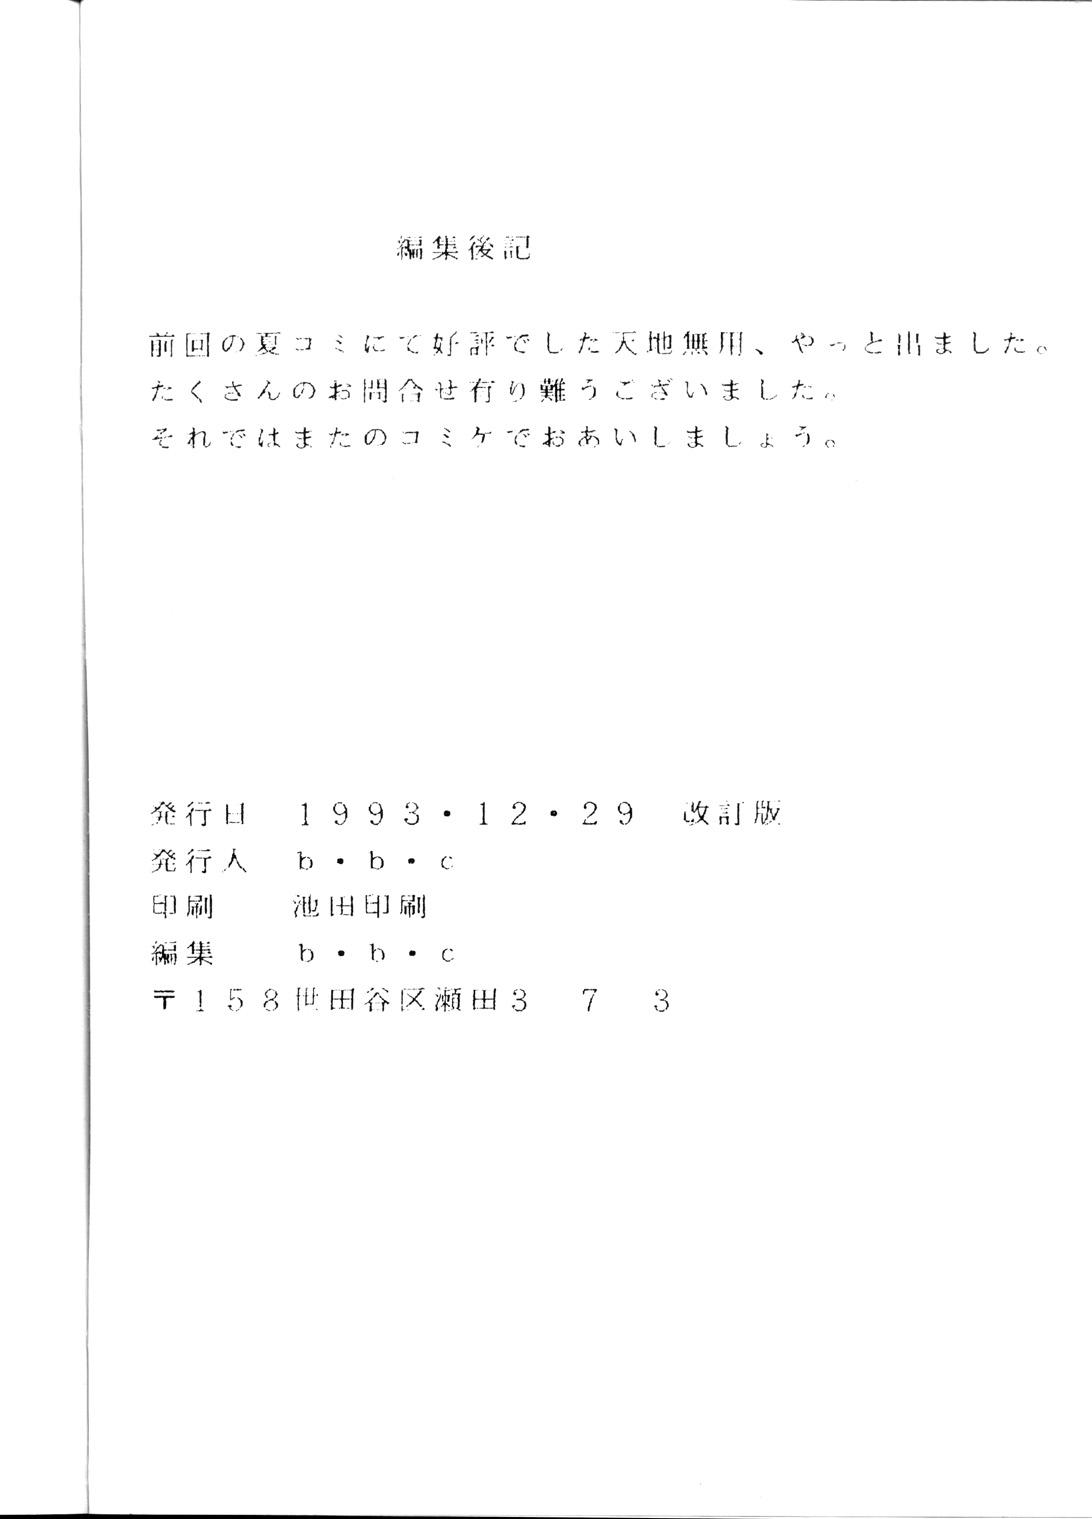 [B.B.C] Tenchi Muyou! Ryou-ou-ki Kaiteiben (Tenchi Muyou!) 80